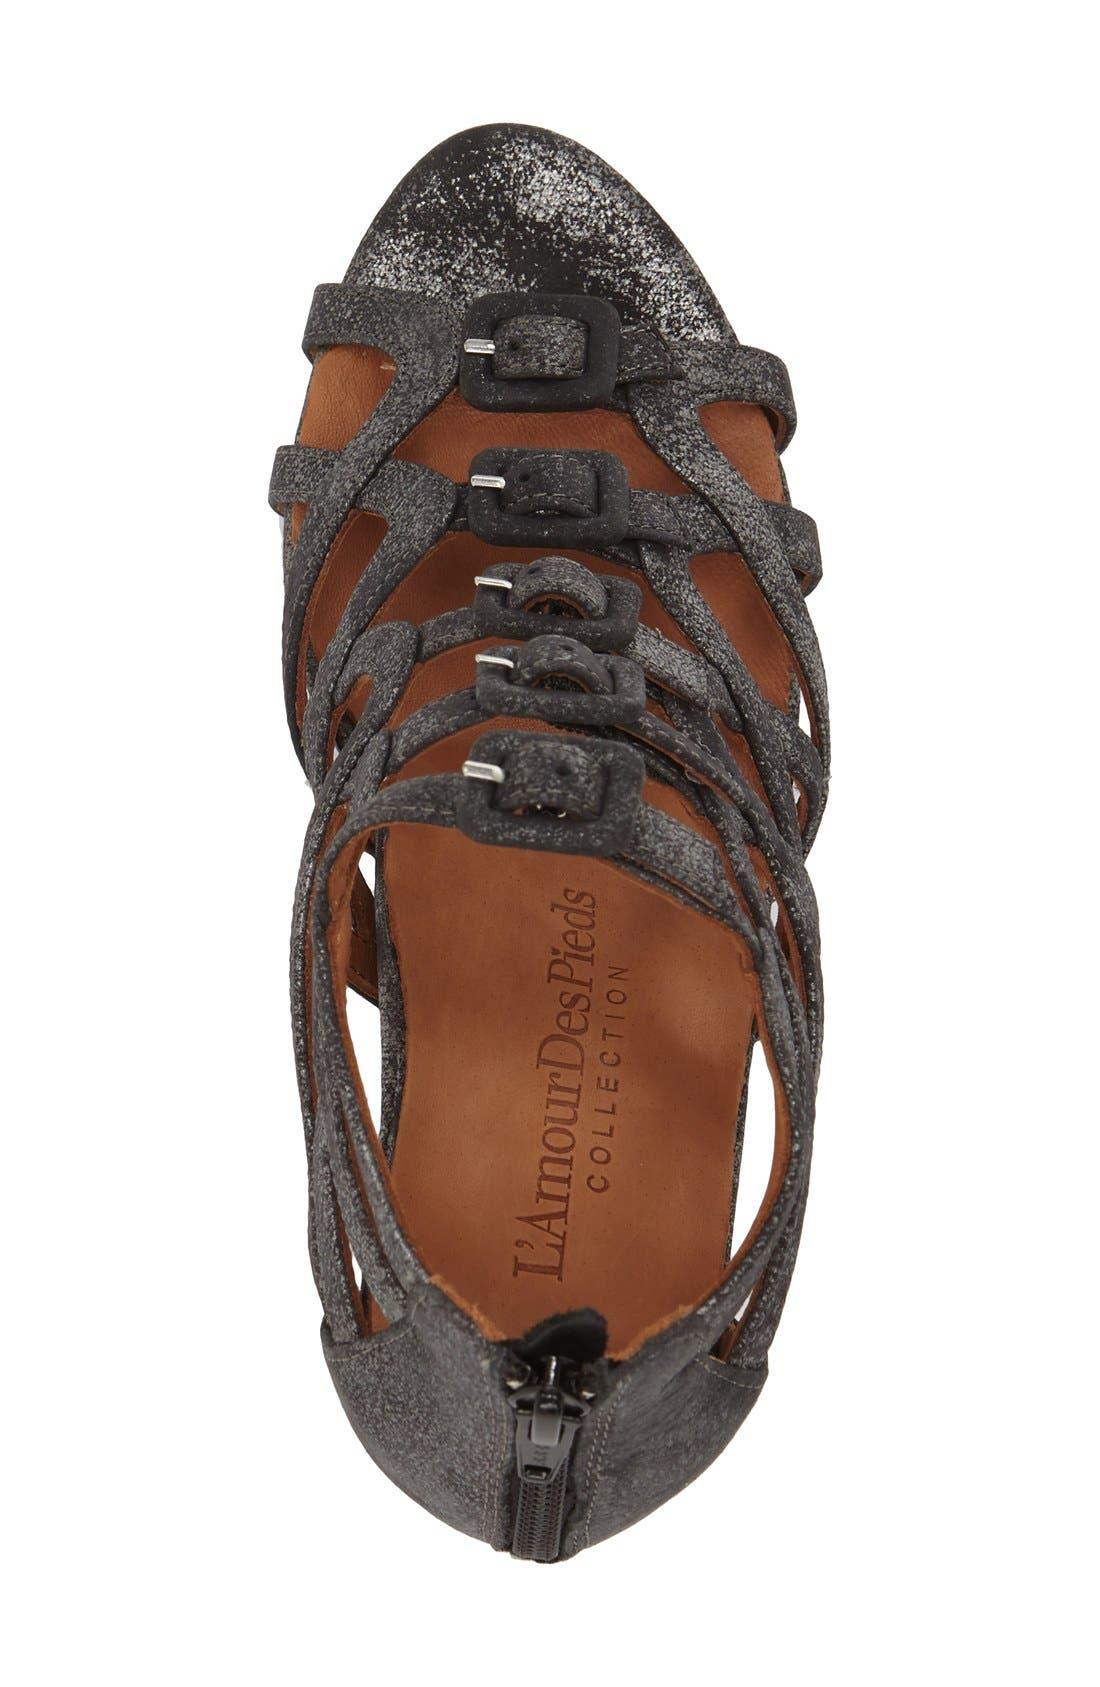 Ivanna' Gladiator Wedge Sandal,                             Alternate thumbnail 3, color,                             Graphite Leather